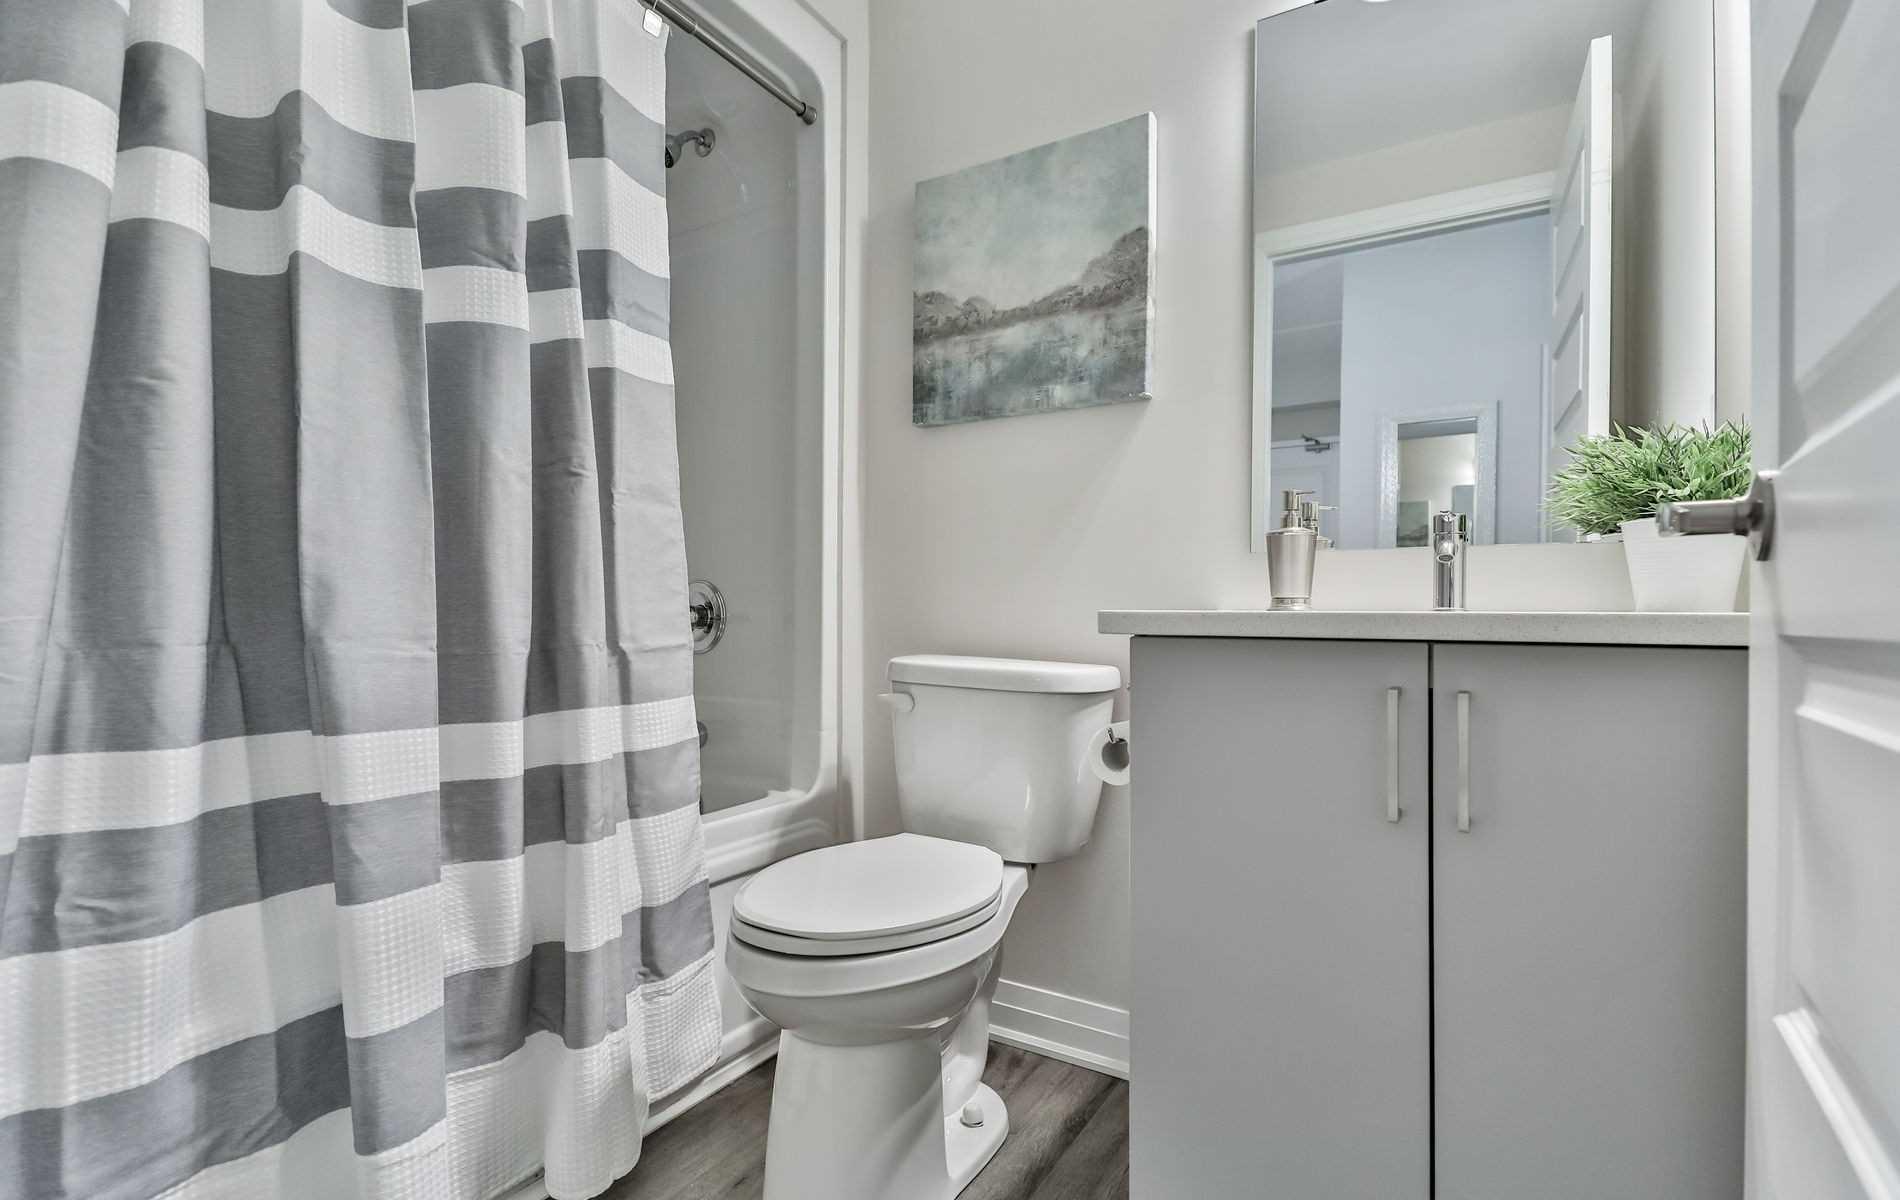 316 - 610 Farmstead Dr - Willmont Condo Apt for sale, 2 Bedrooms (W5399854) - #21